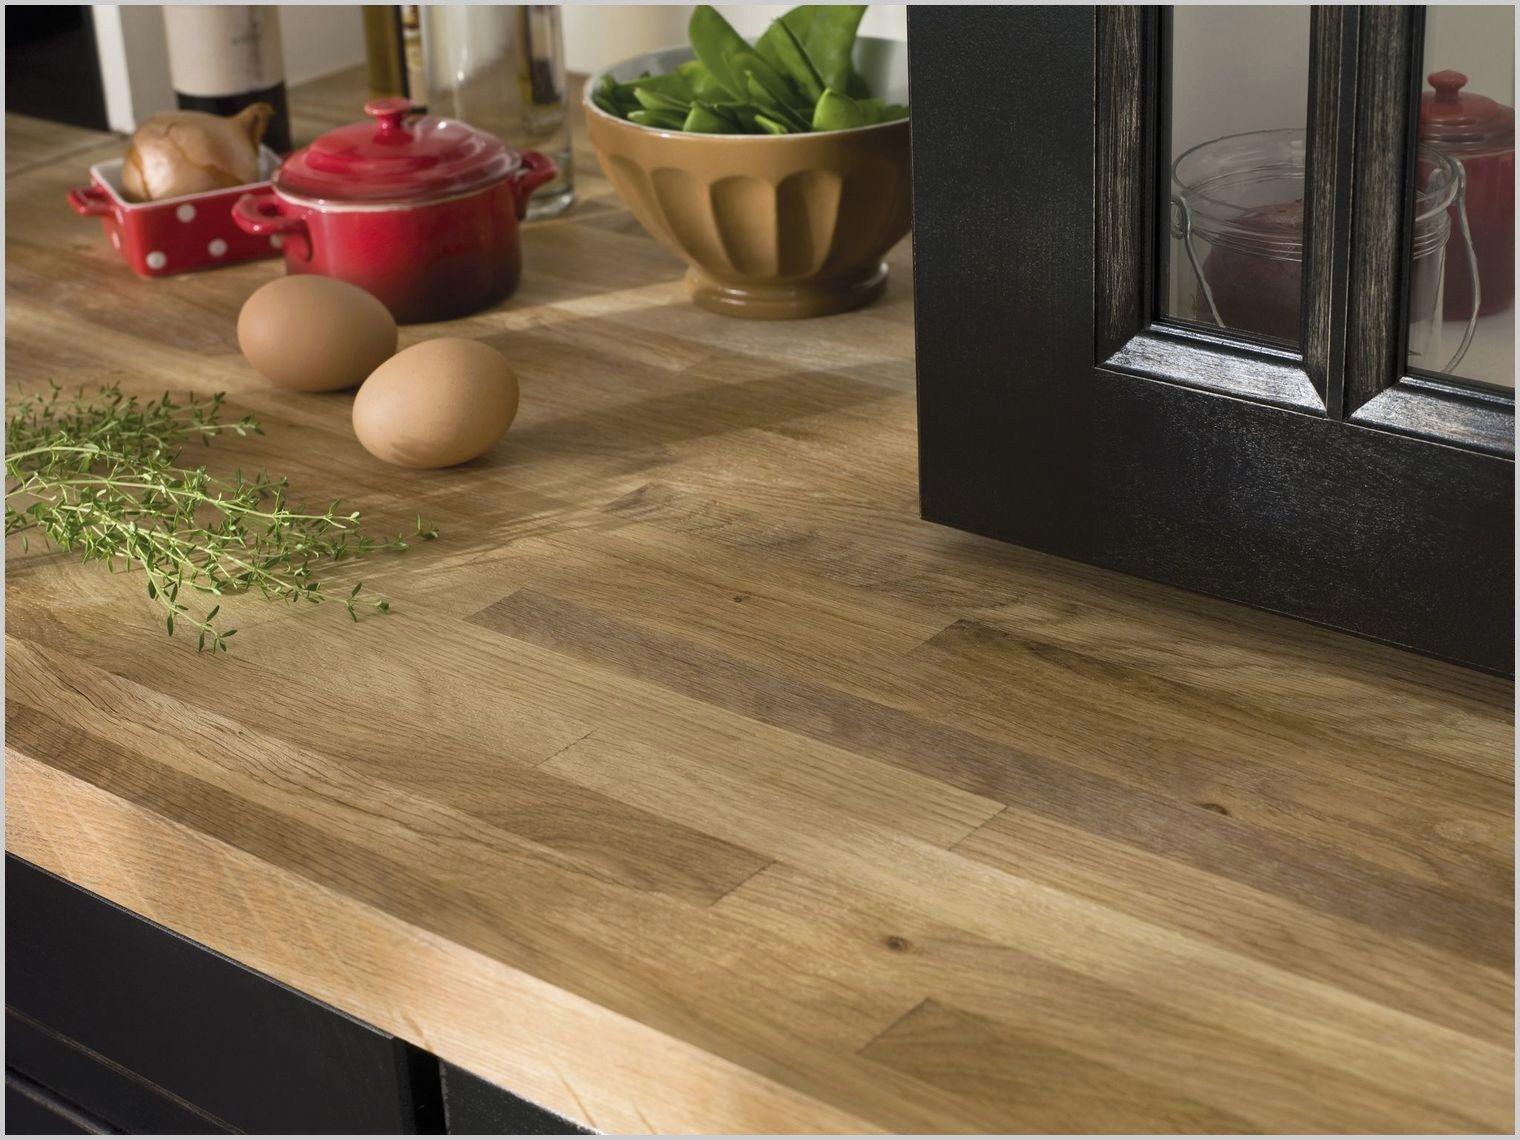 Meilleur Panneau Stratifie Leroy Merlin In 2020 Types Of Kitchen Countertops Kitchen Worktop Rustic Kitchen